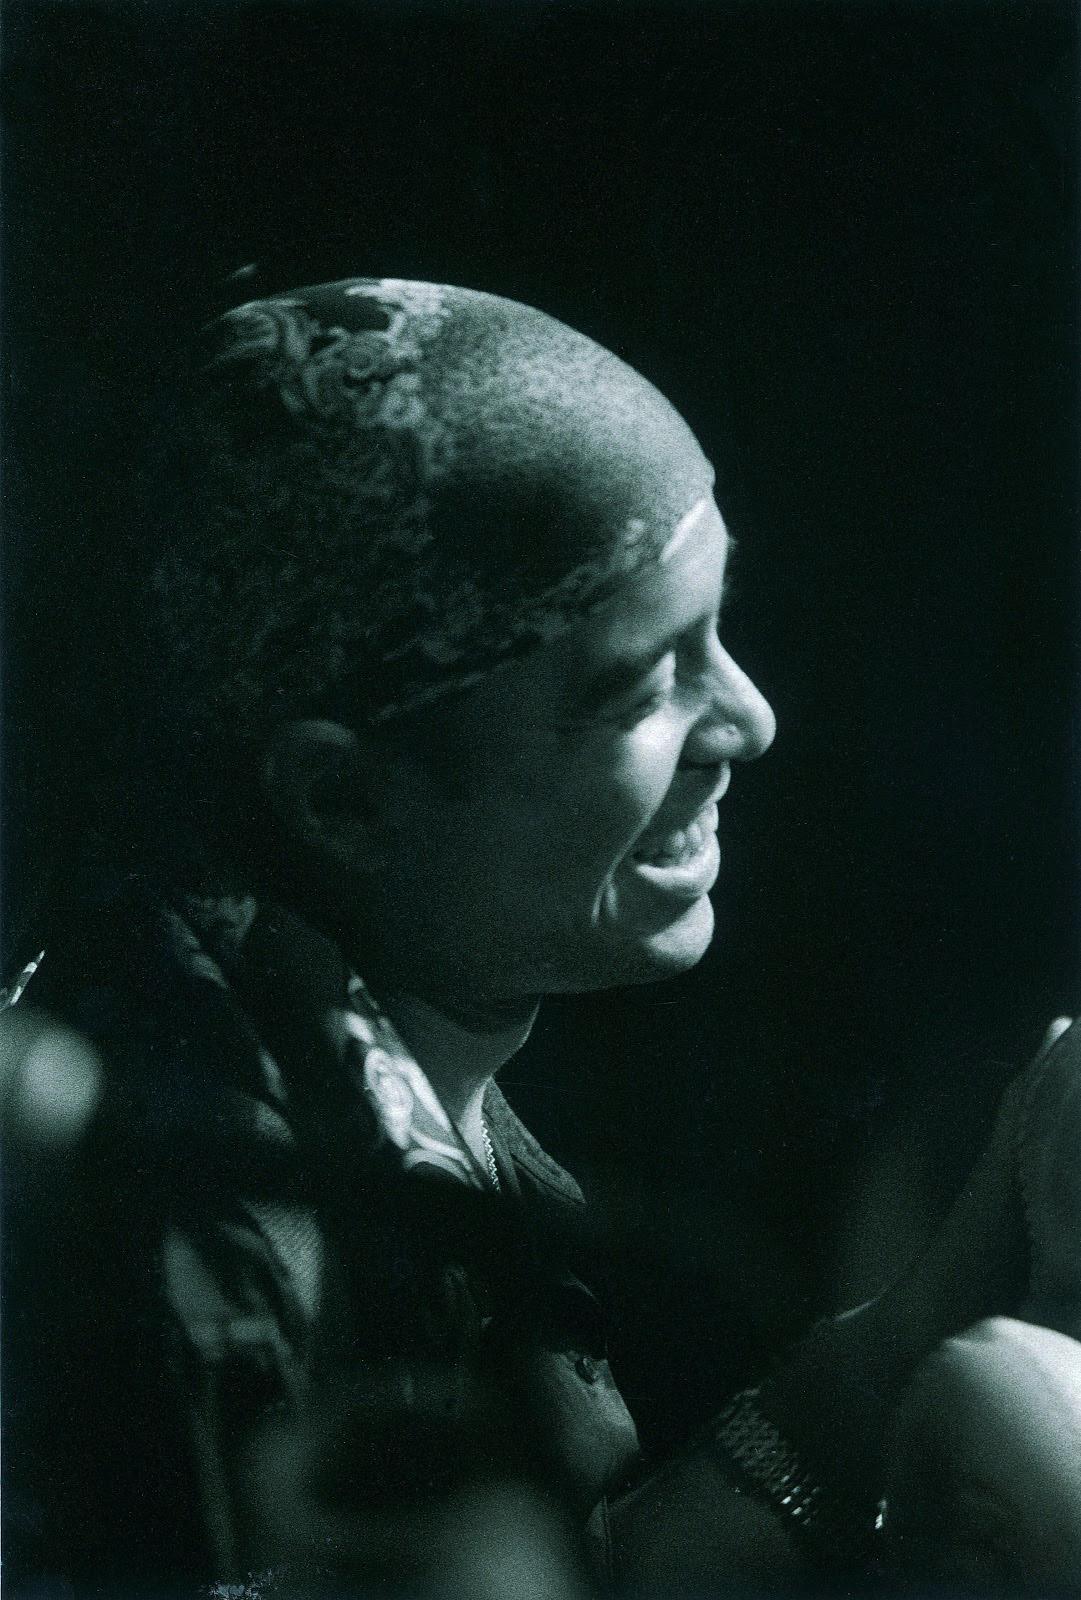 Adolfo Guzmán - Concurso Adolfo Guzmán De Música Cubana, ICRT. Vol. I